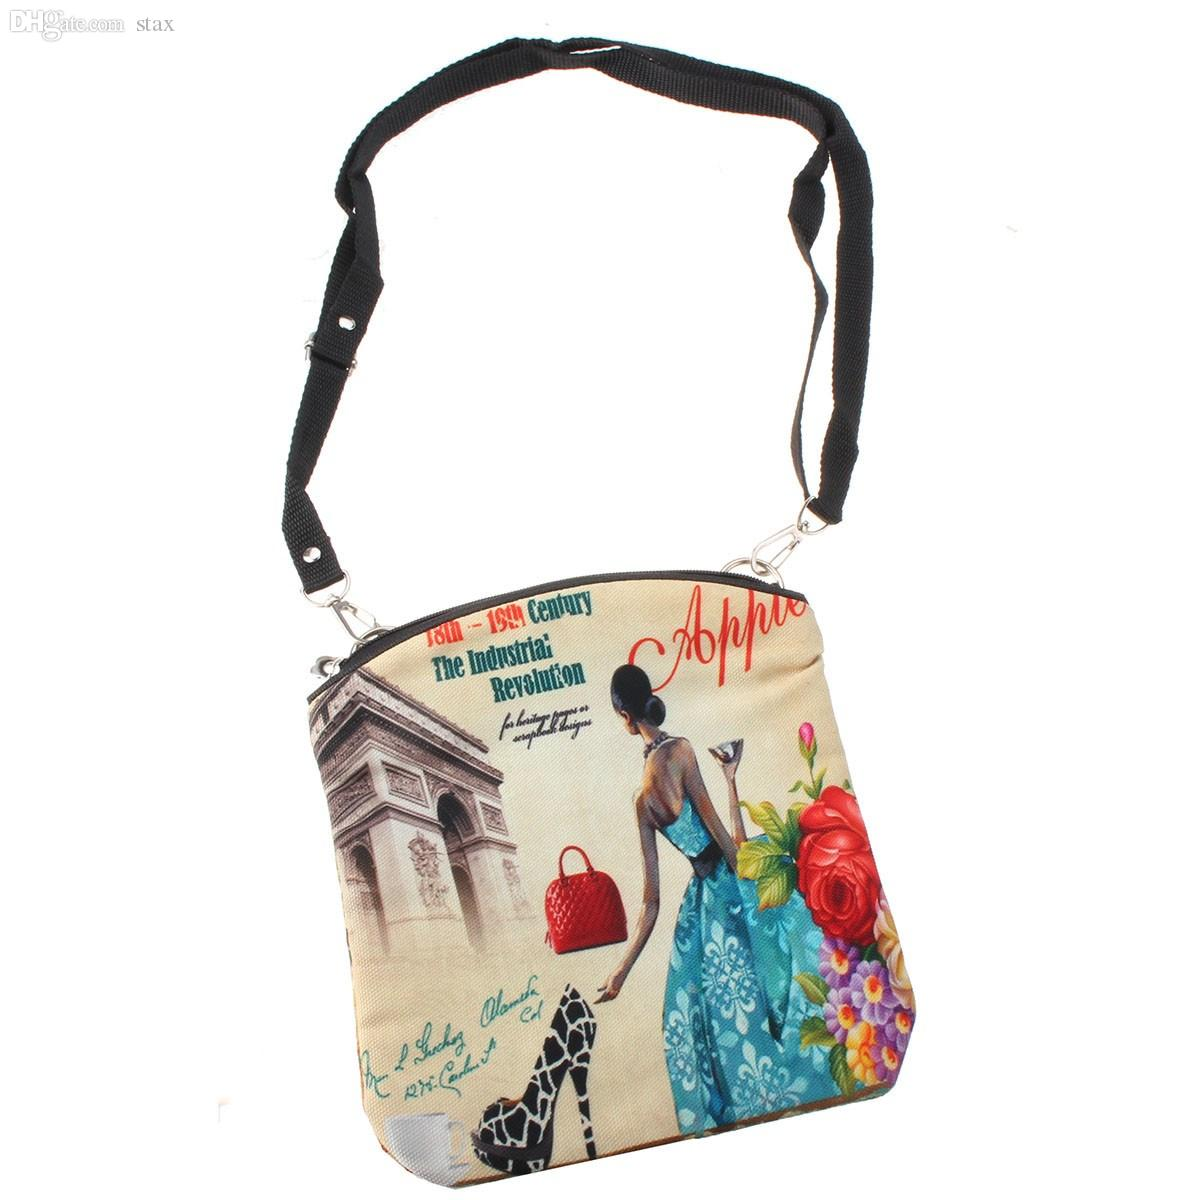 ef5655281816 Wholesale New Women Messenger Bags Vintage Canvas Printing Small Satchel  Shoulder European Style Girls Handbag Lady Bolsa Crossbody Bag Ladies  Handbags ...